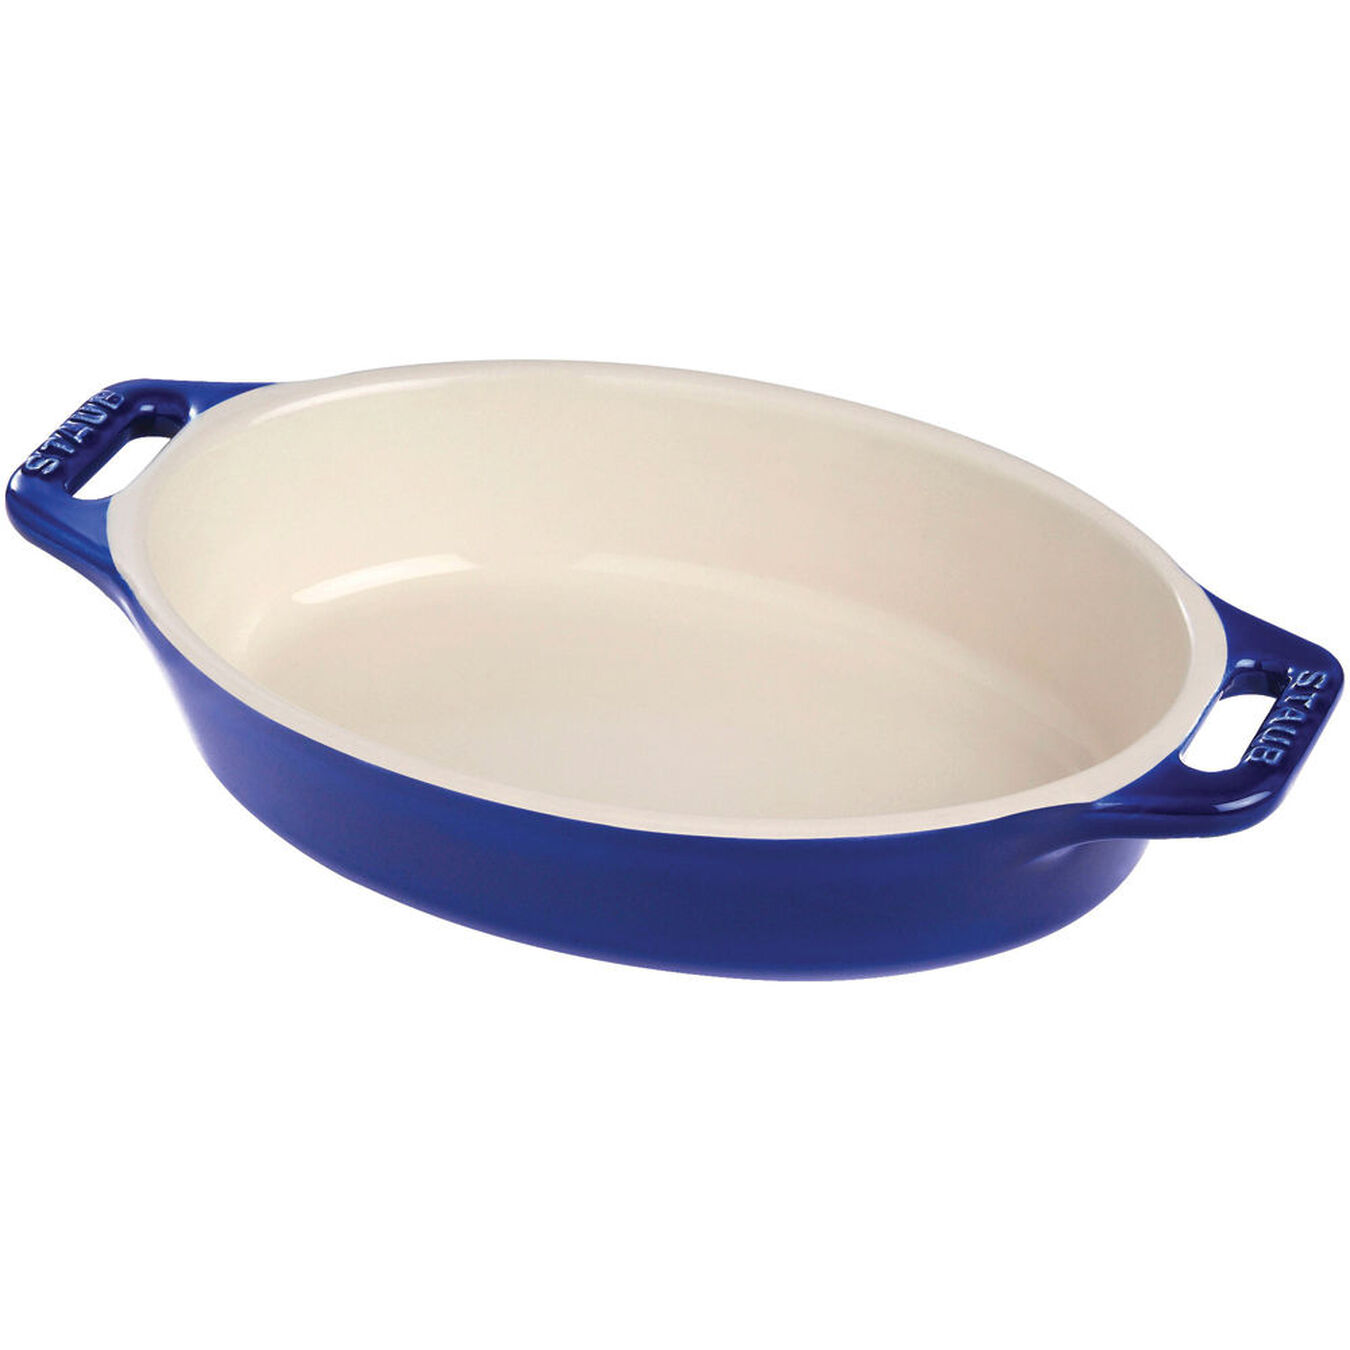 6.5-inch Oval Baking Dish - Dark Blue,,large 1